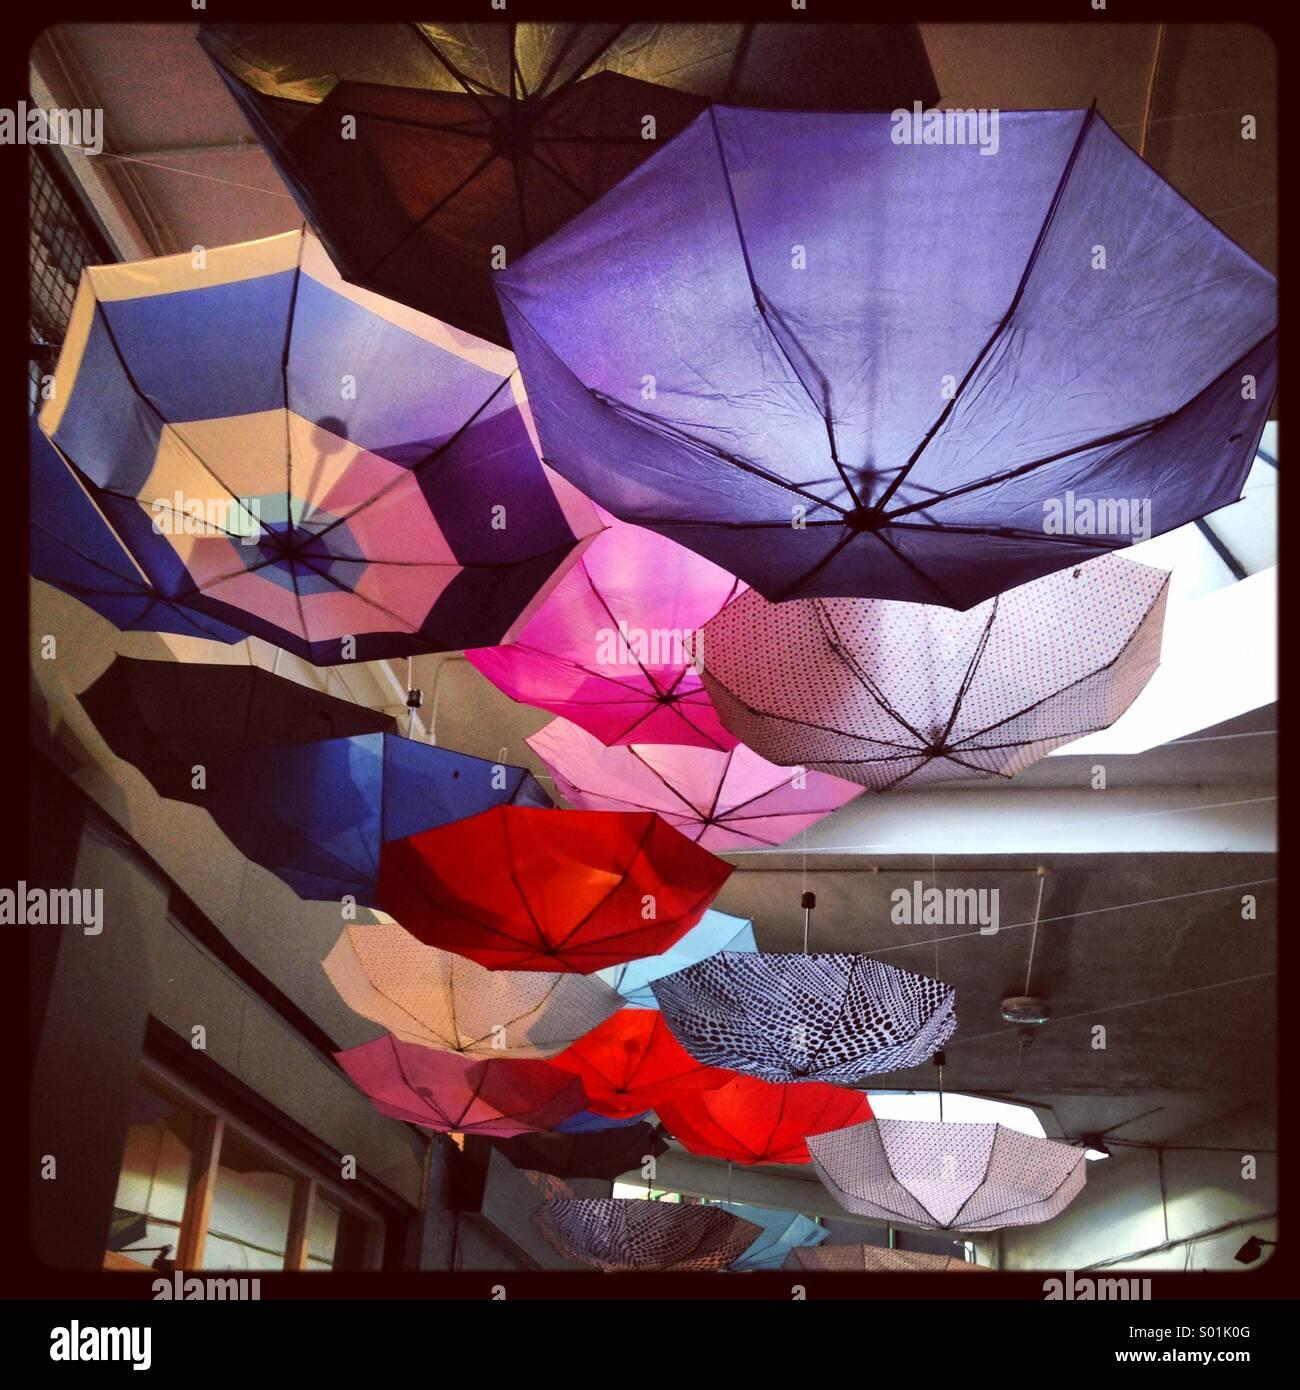 Umbrellas hanging upside down in Brixton Village London. - Stock Image